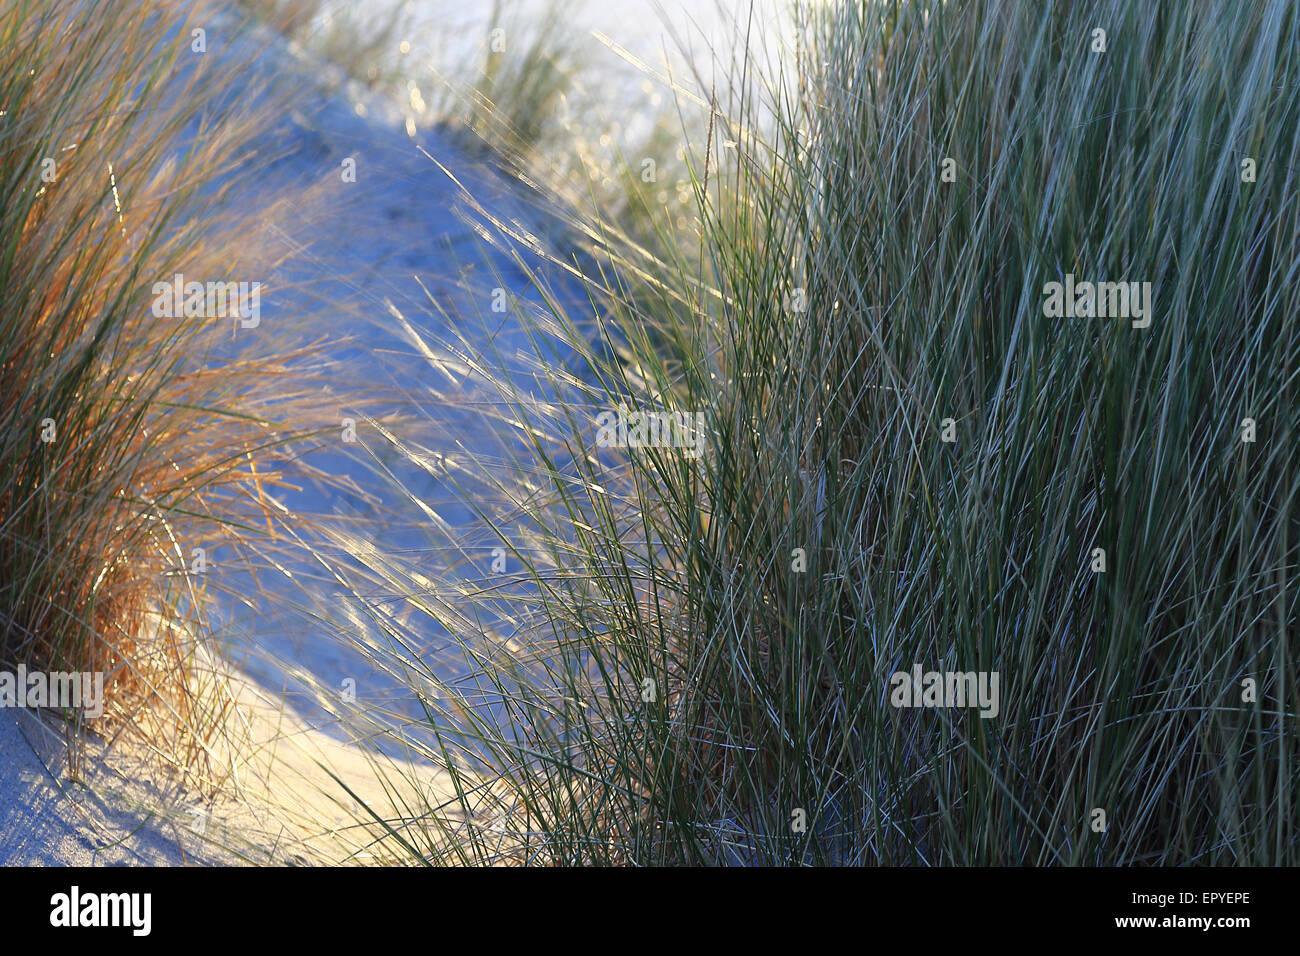 Marram grass, Harris Island, Outer Hebrides, Scotland, United Kingdom - Stock Image